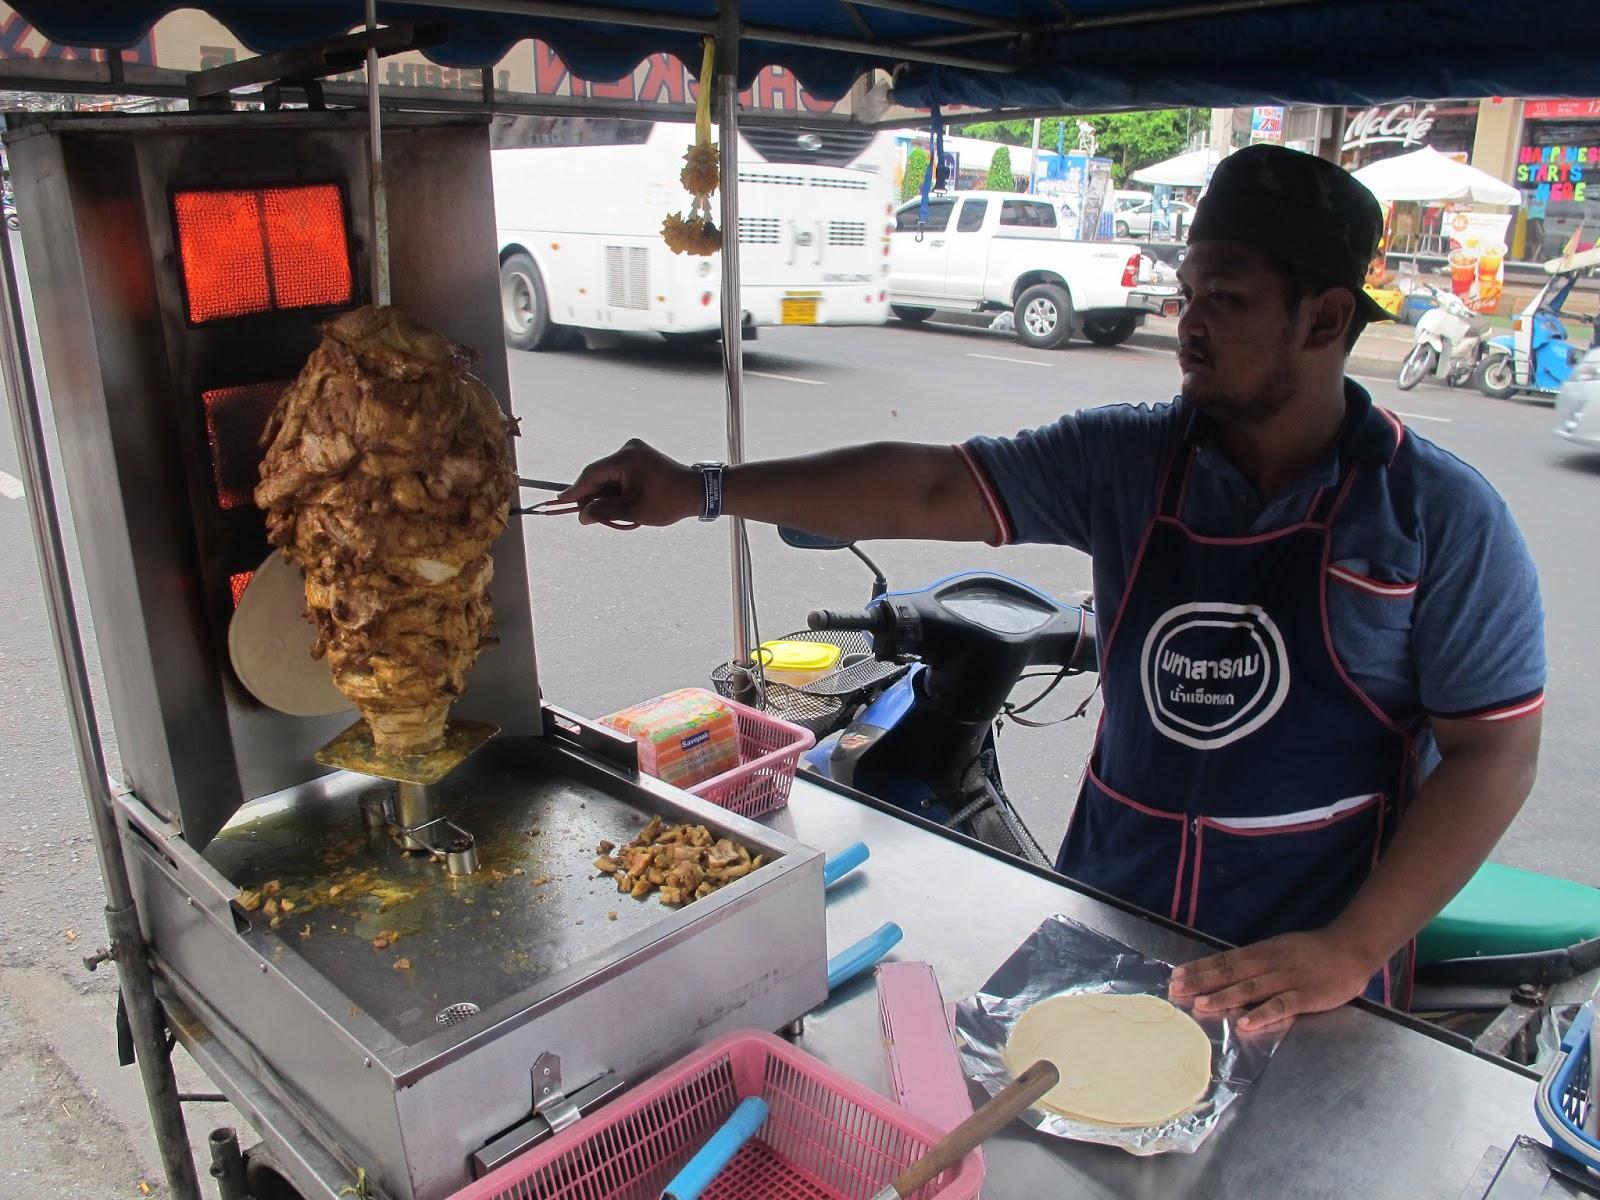 Doners Kebab Food Truck